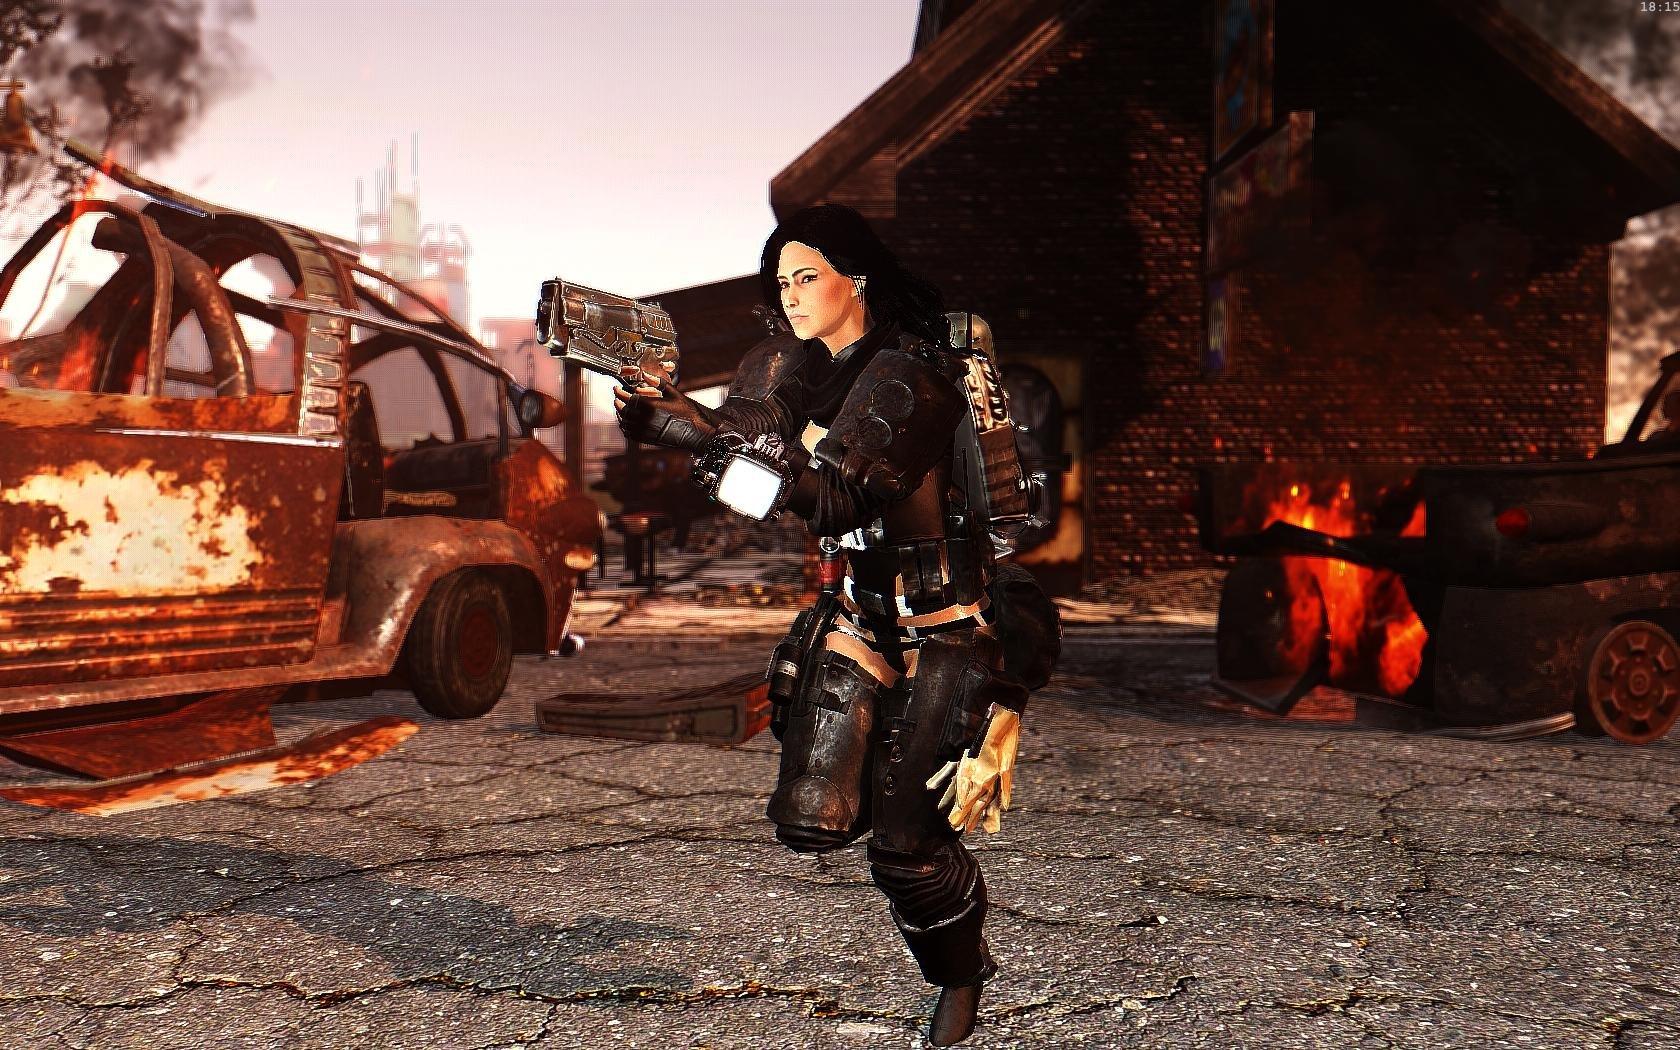 Fallout4 2018-10-27 18-15-04-93.jpg